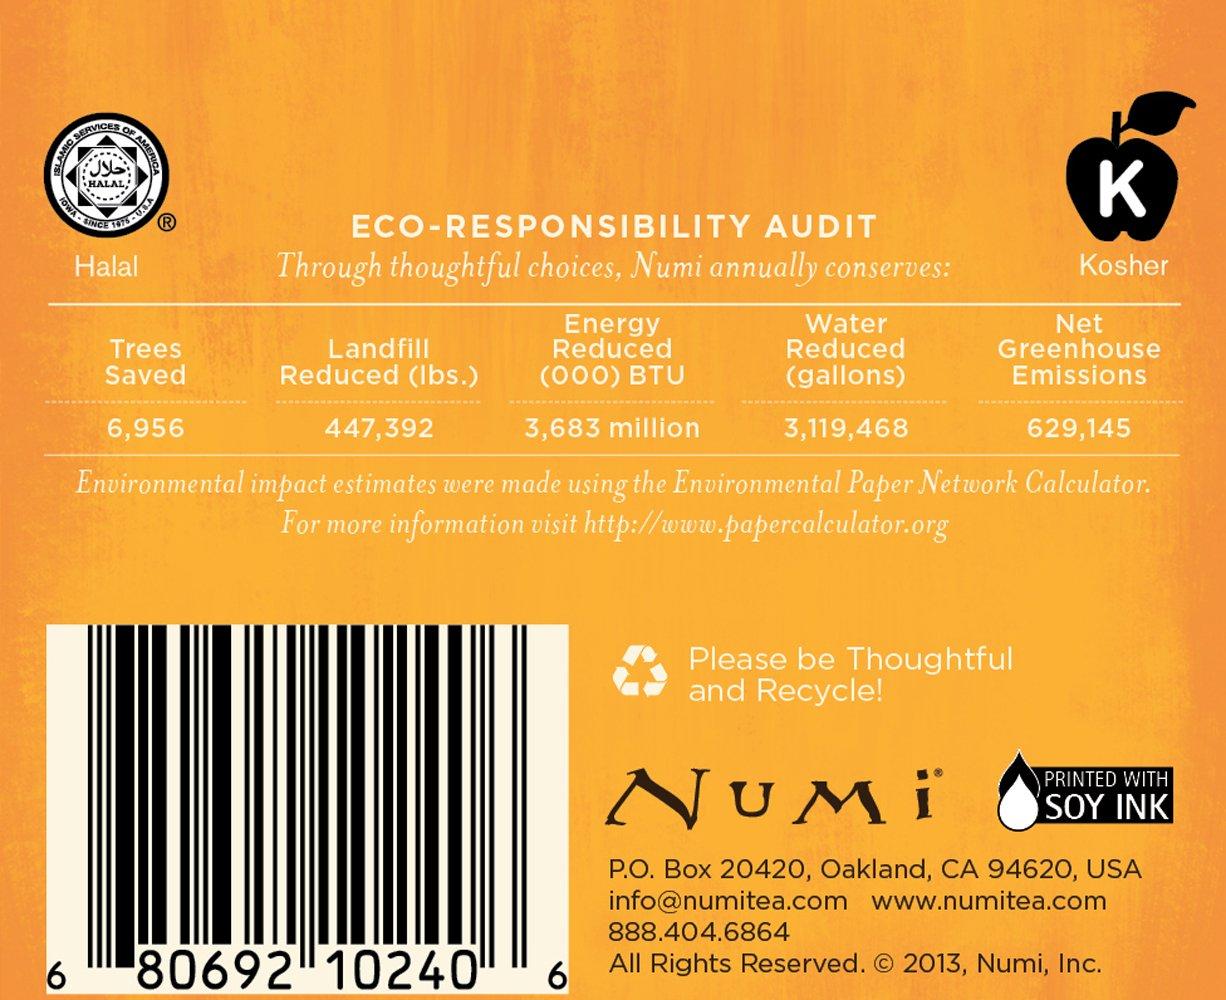 Numi Organic Tea White Orange Spice, Full Leaf White Tea, 16-Count Tea Bags, 1.58 Oz  (Pack of 2) by Numi Organic Tea (Image #6)